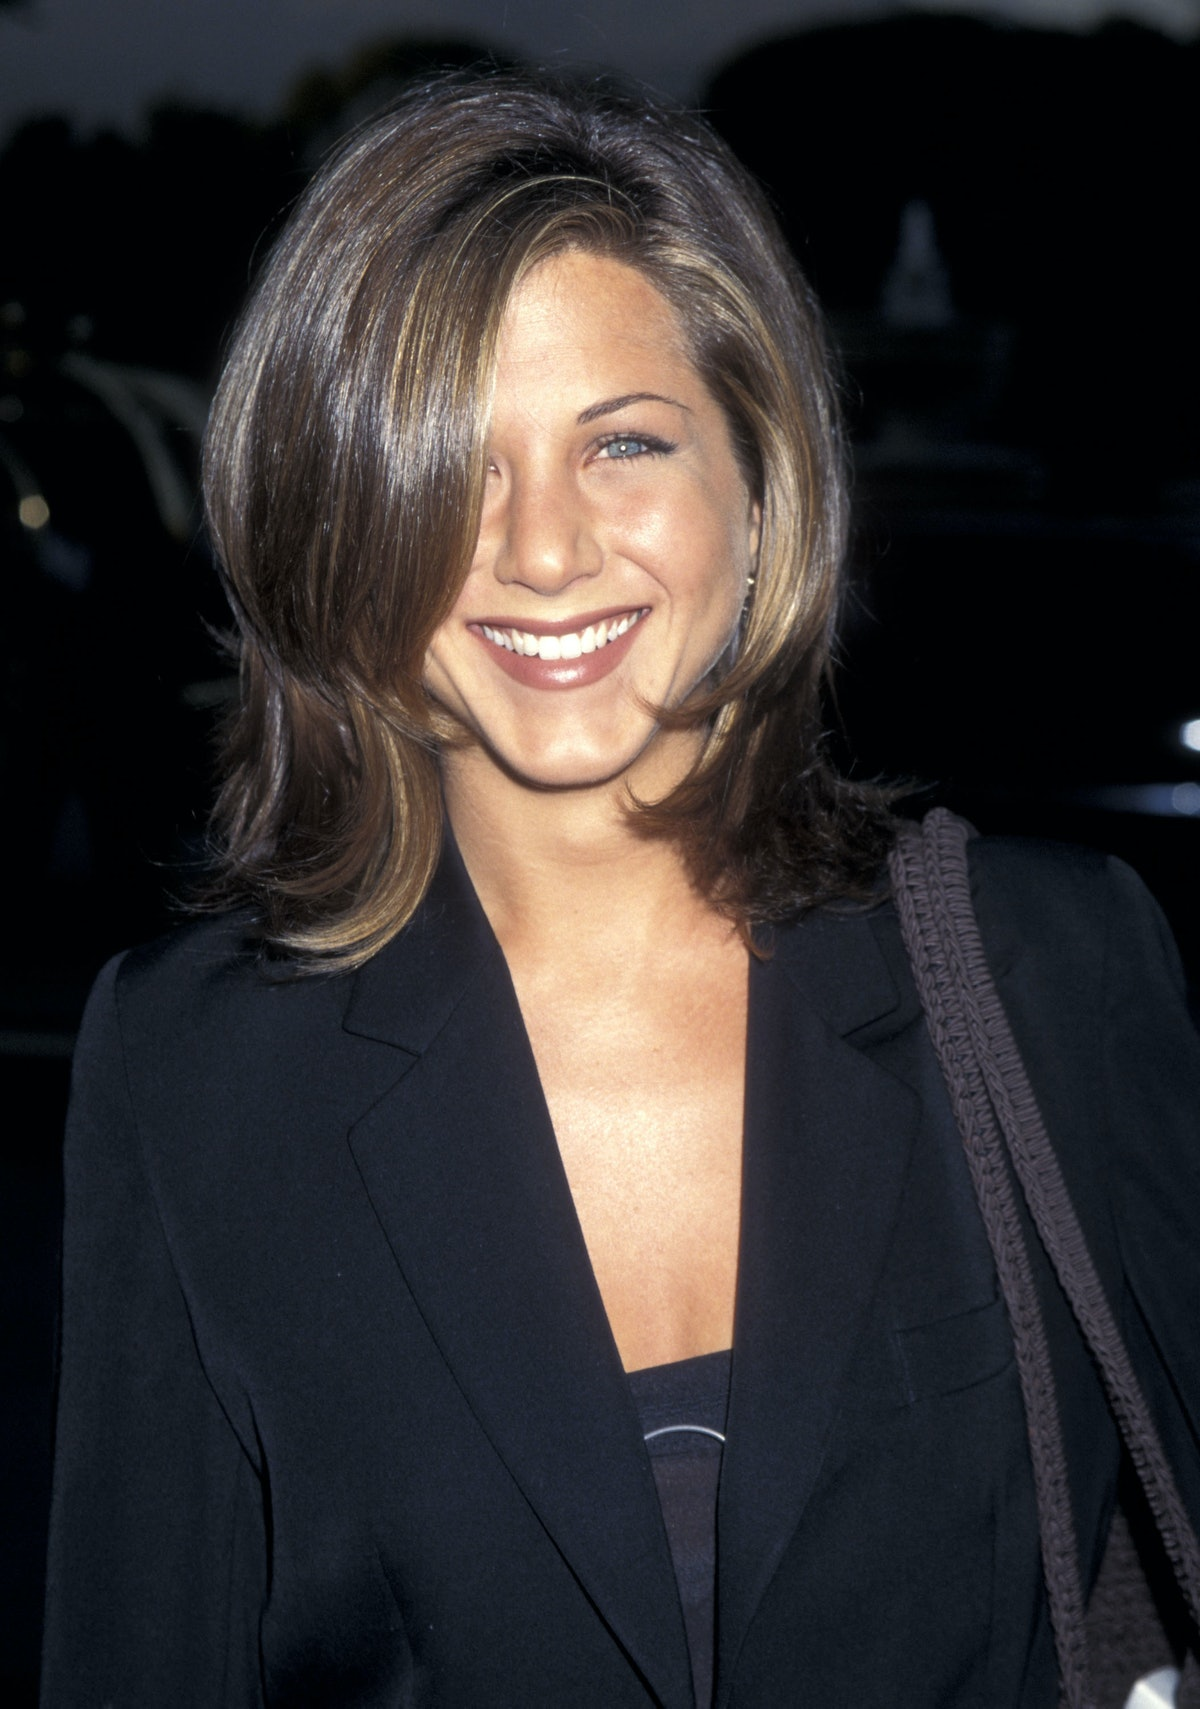 PASADENA,CA - JULY 21:   Actress Jennifer Aniston attends the 11th Annual Television Critics Associa...